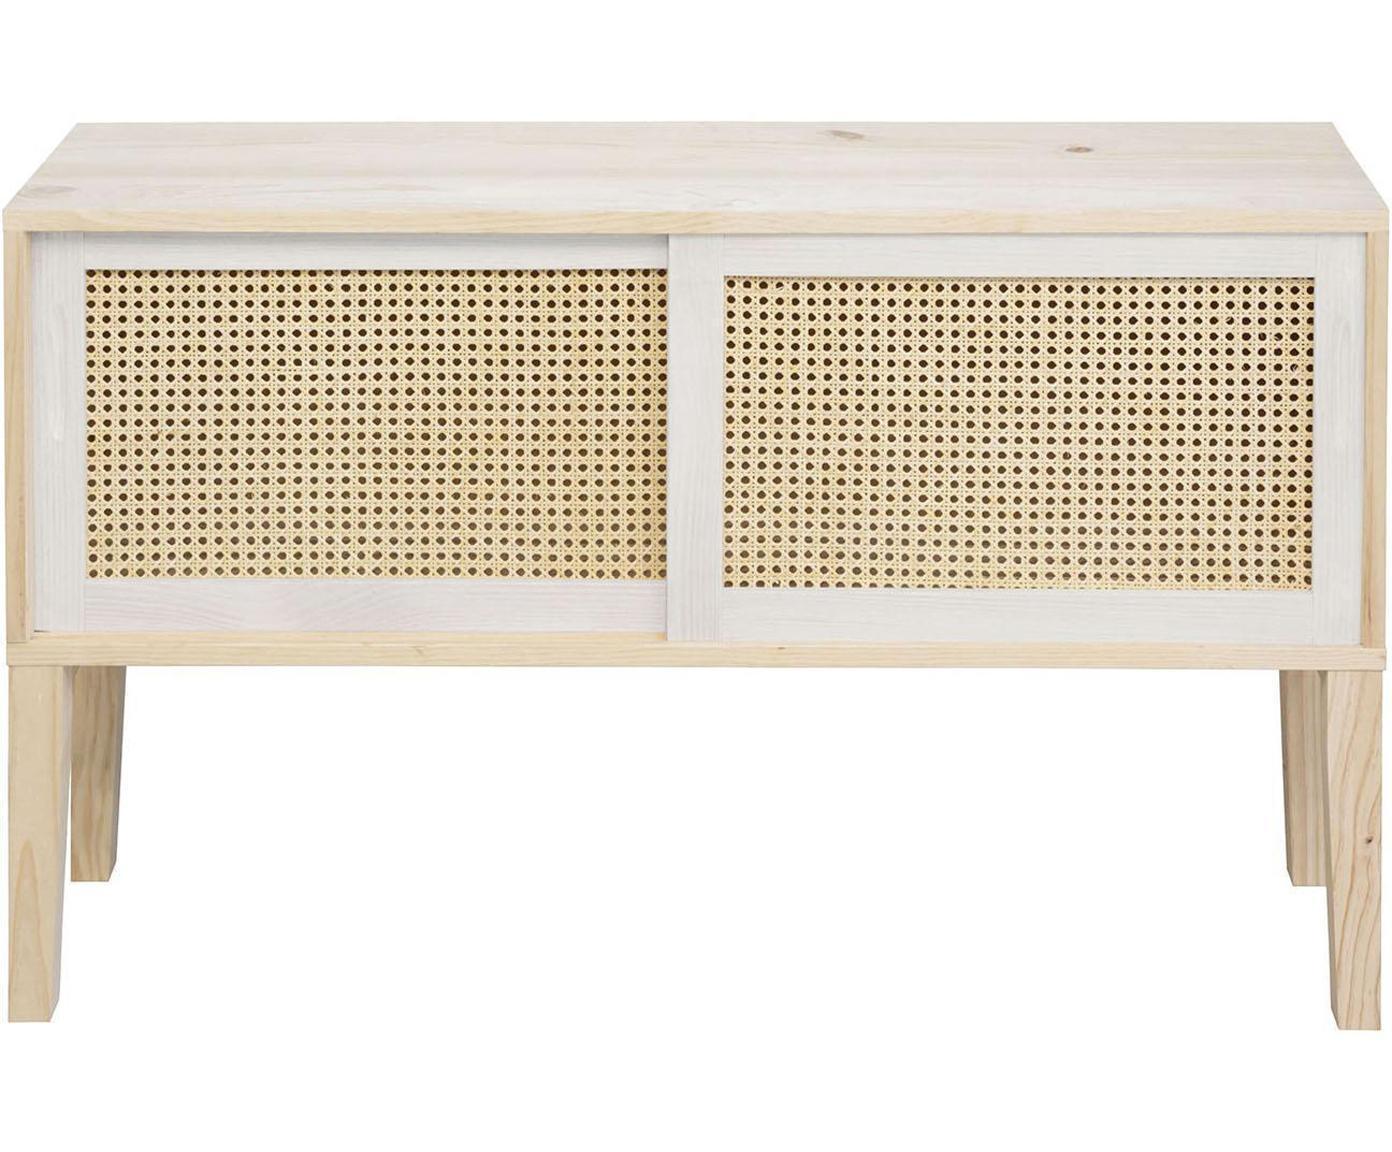 Aparador de madera de pino Rejilla, Blanco, An 115 x Al 68 cm